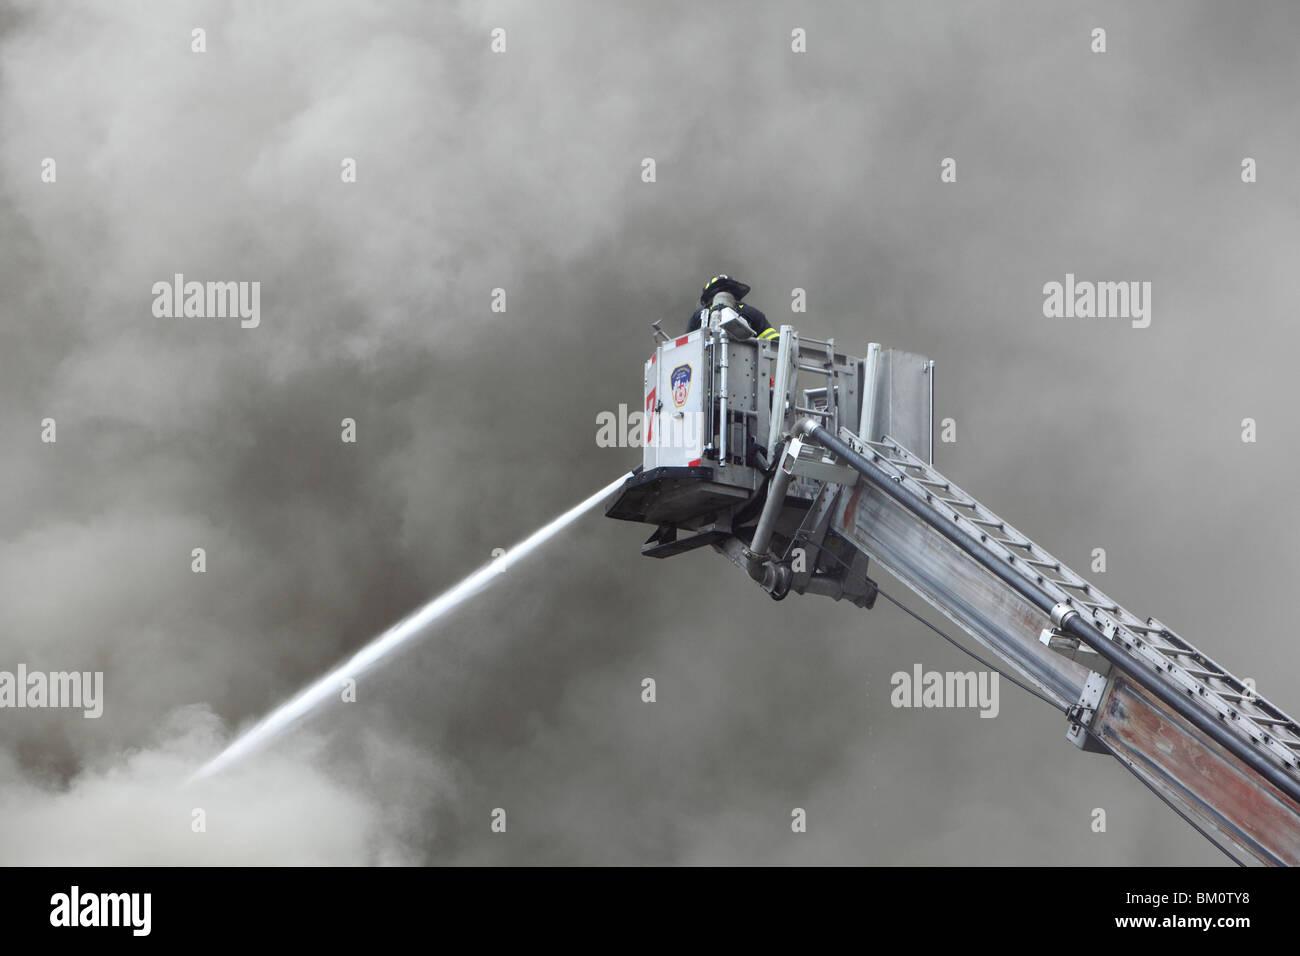 firefighter battling a smoky fire Stock Photo